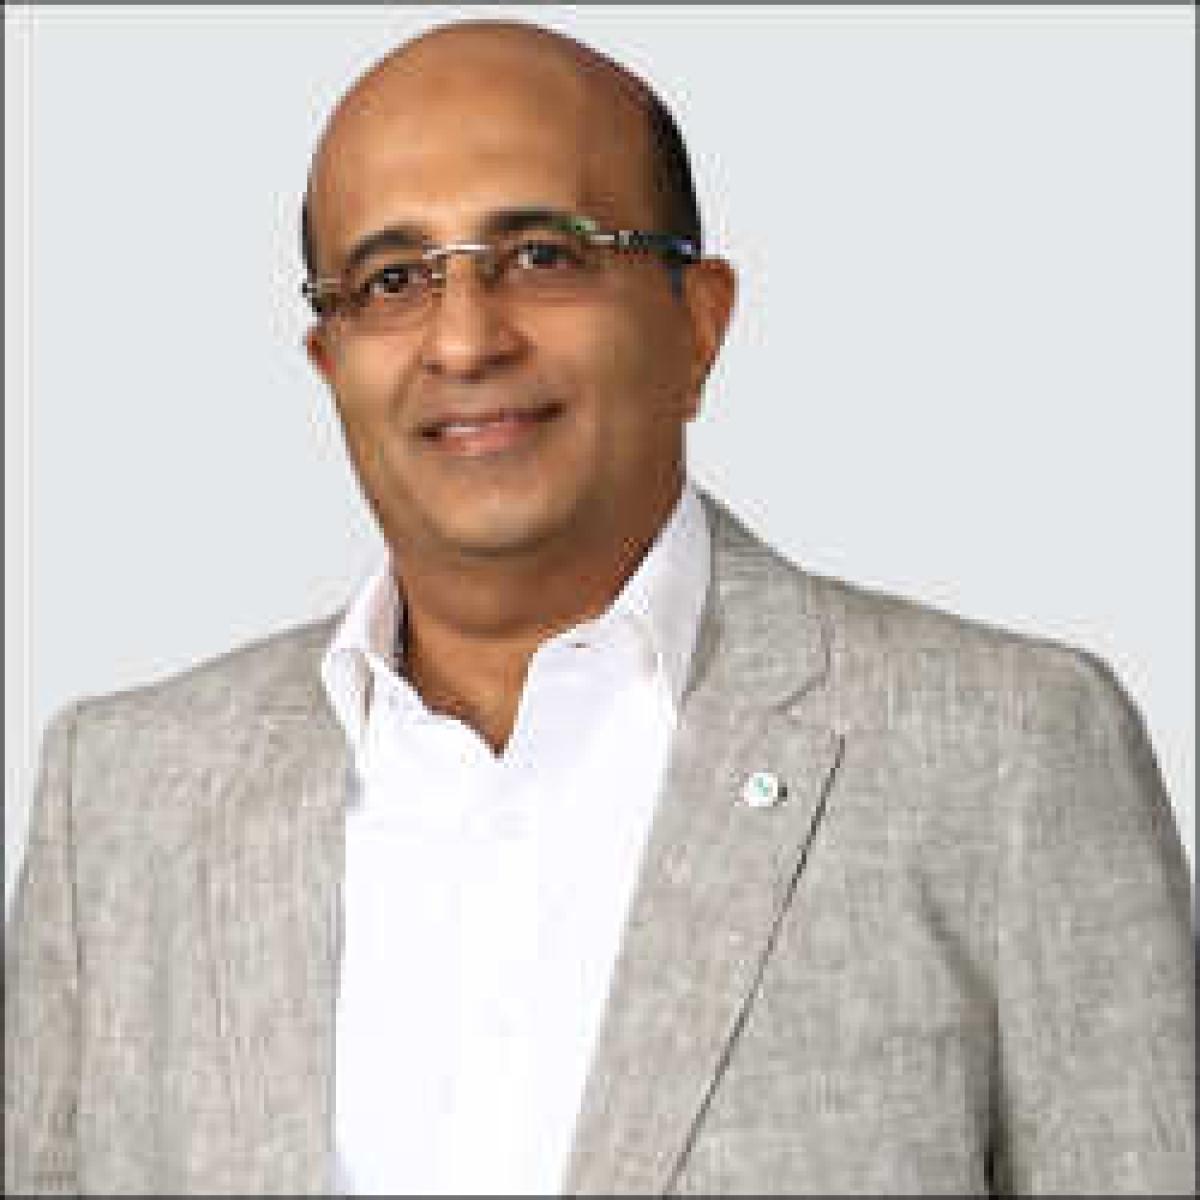 Leo Burnett India wins creative mandate for Cholayil's Medimix, Cuticura and Krishna Thulasi brands